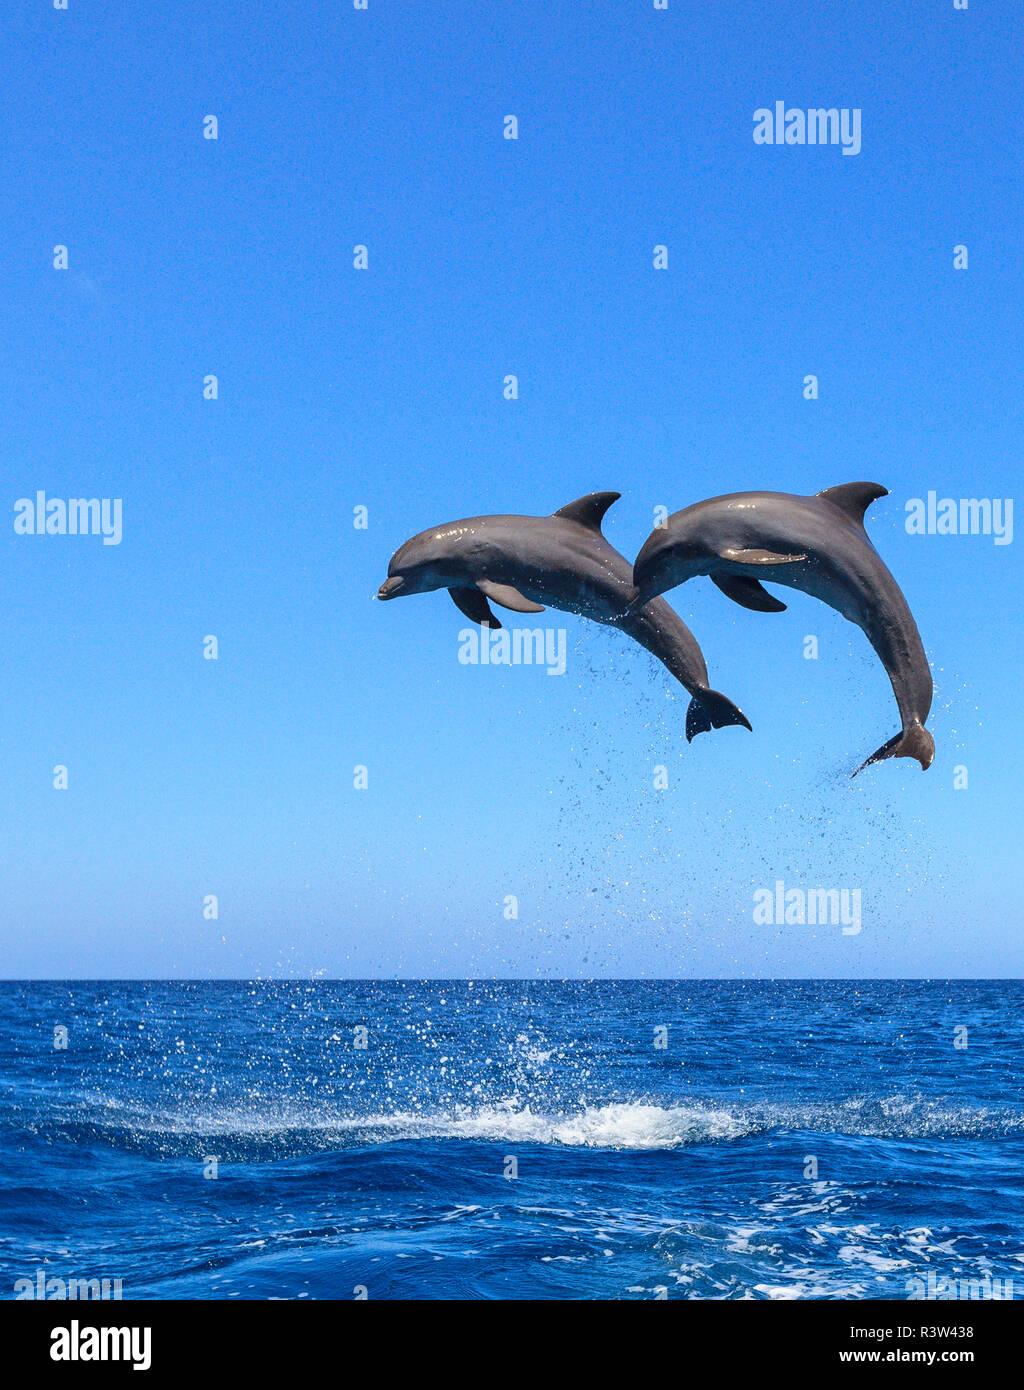 Bottlenose Dolphins (Tursiops Truncatus) Caribbean Sea, Roatan, Bay Islands, Honduras - Stock Image